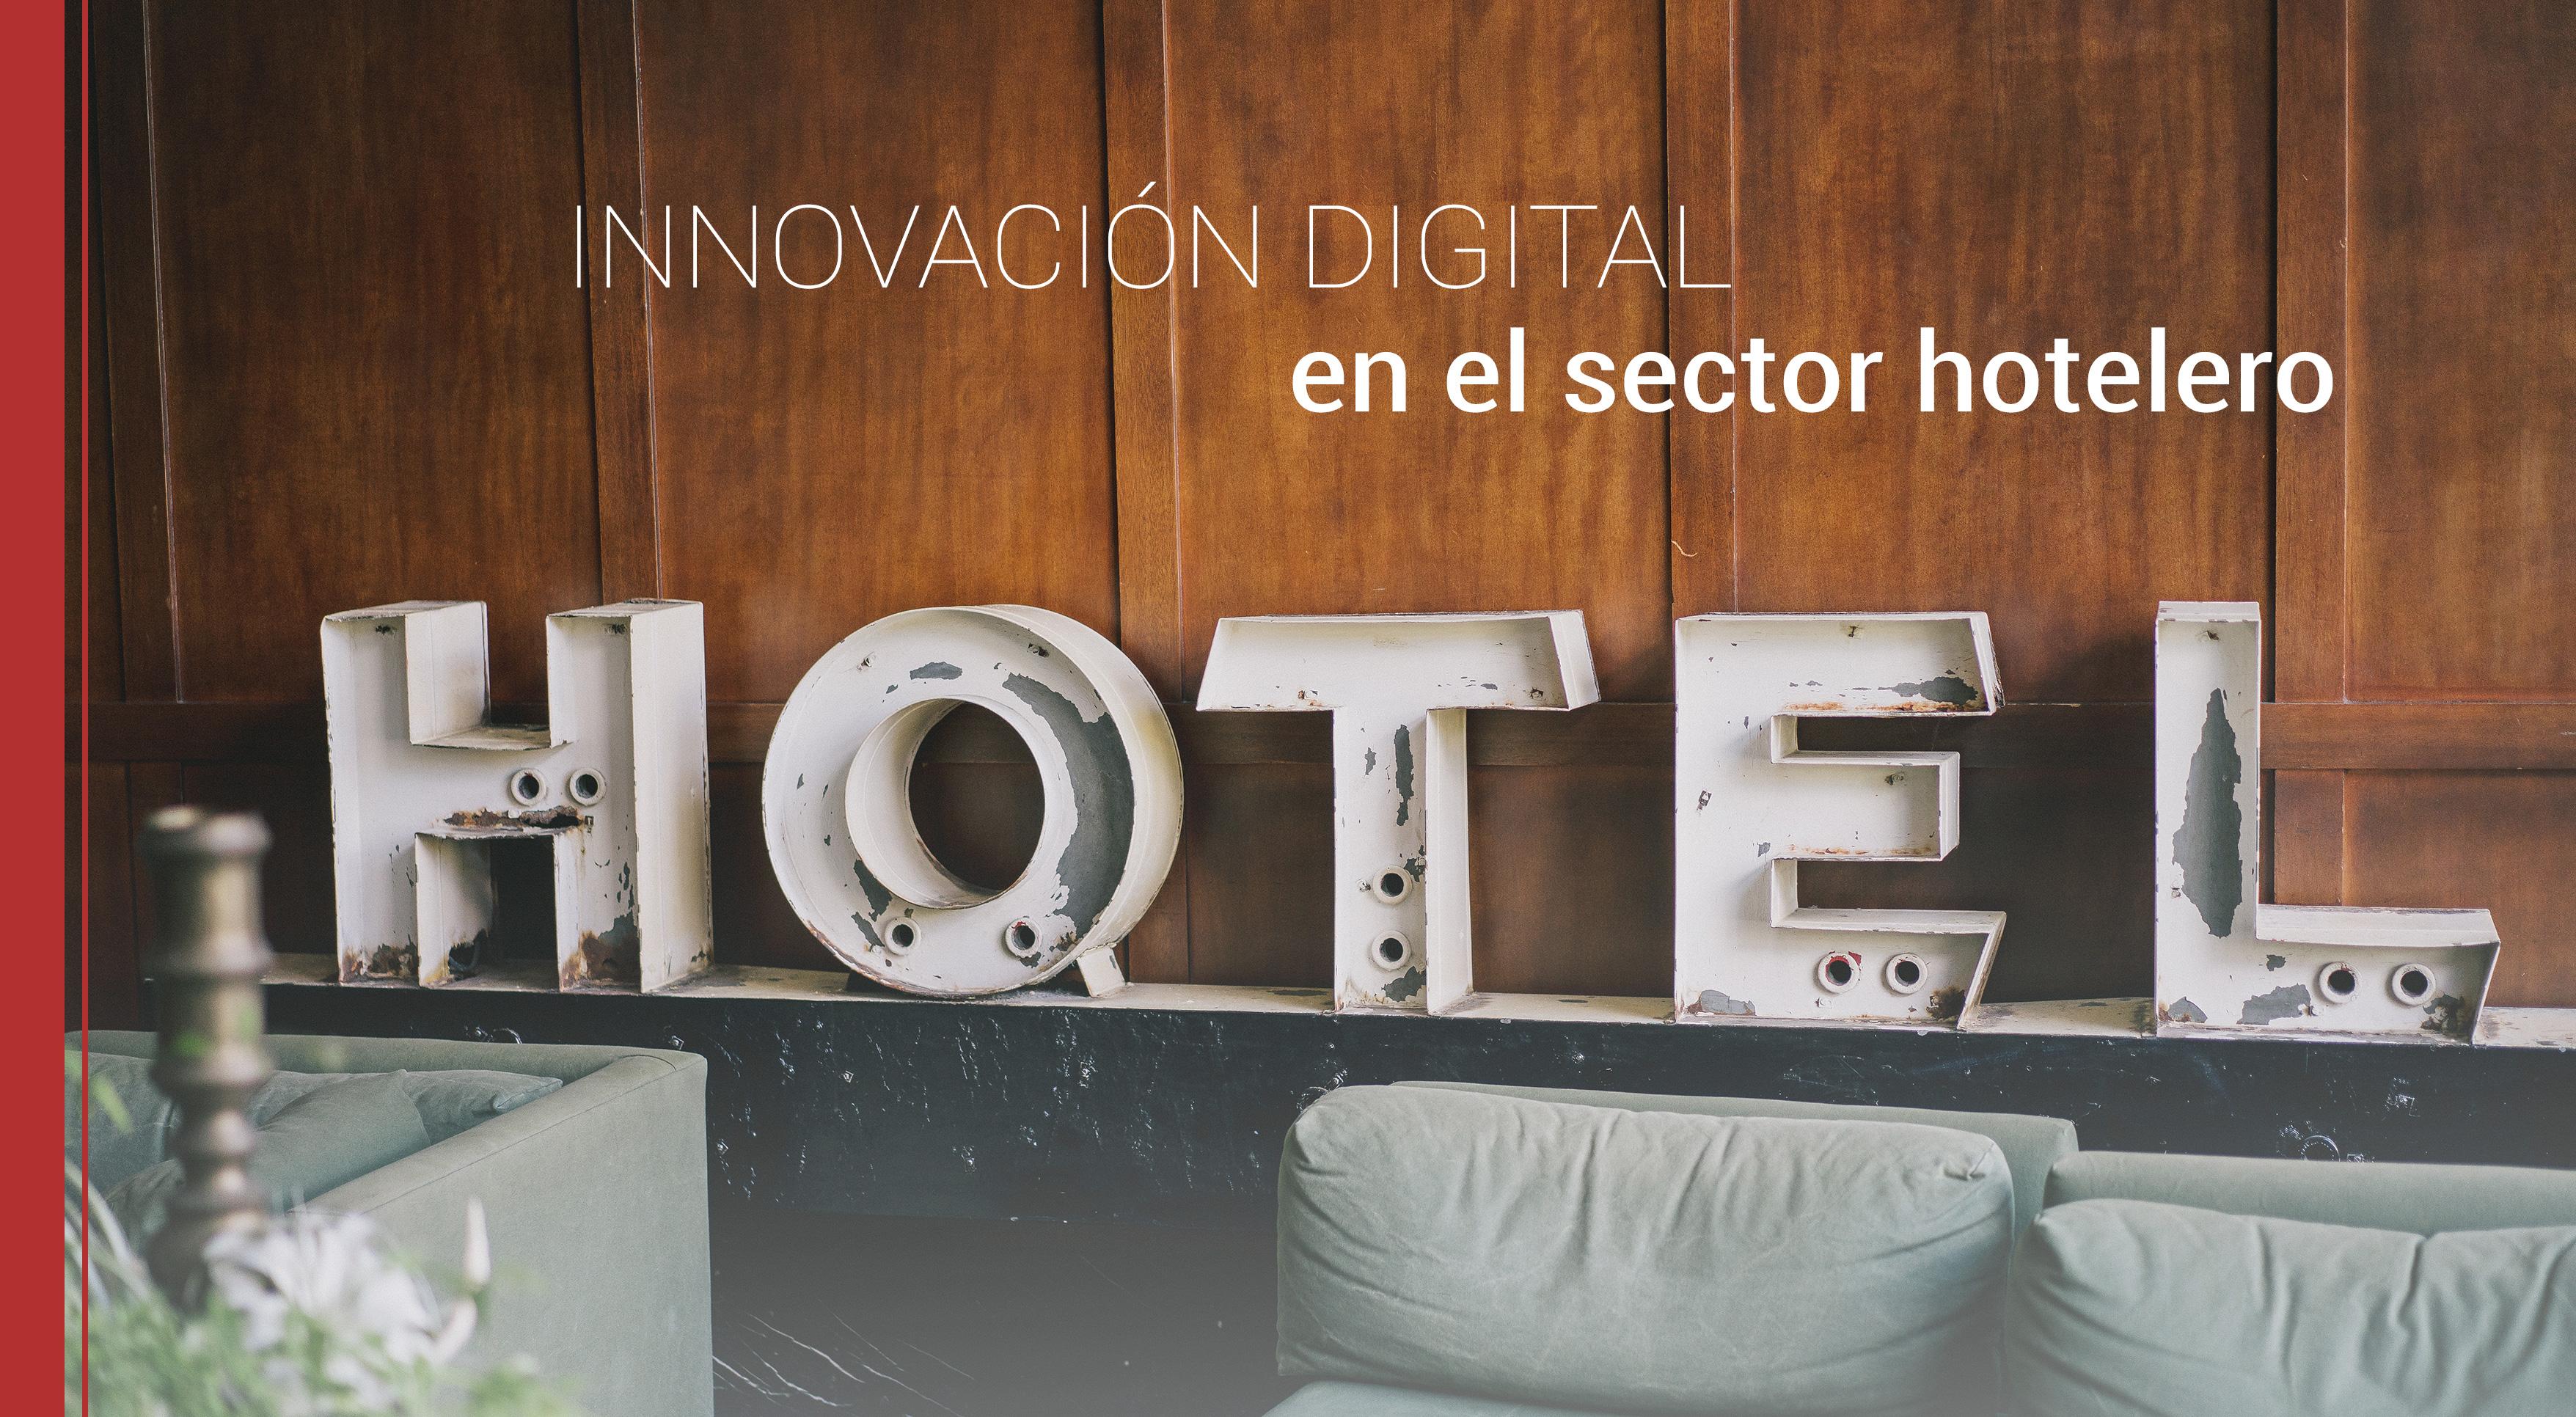 innovacion-digital-sector-hotelero Innovación digital en el sector hotelero